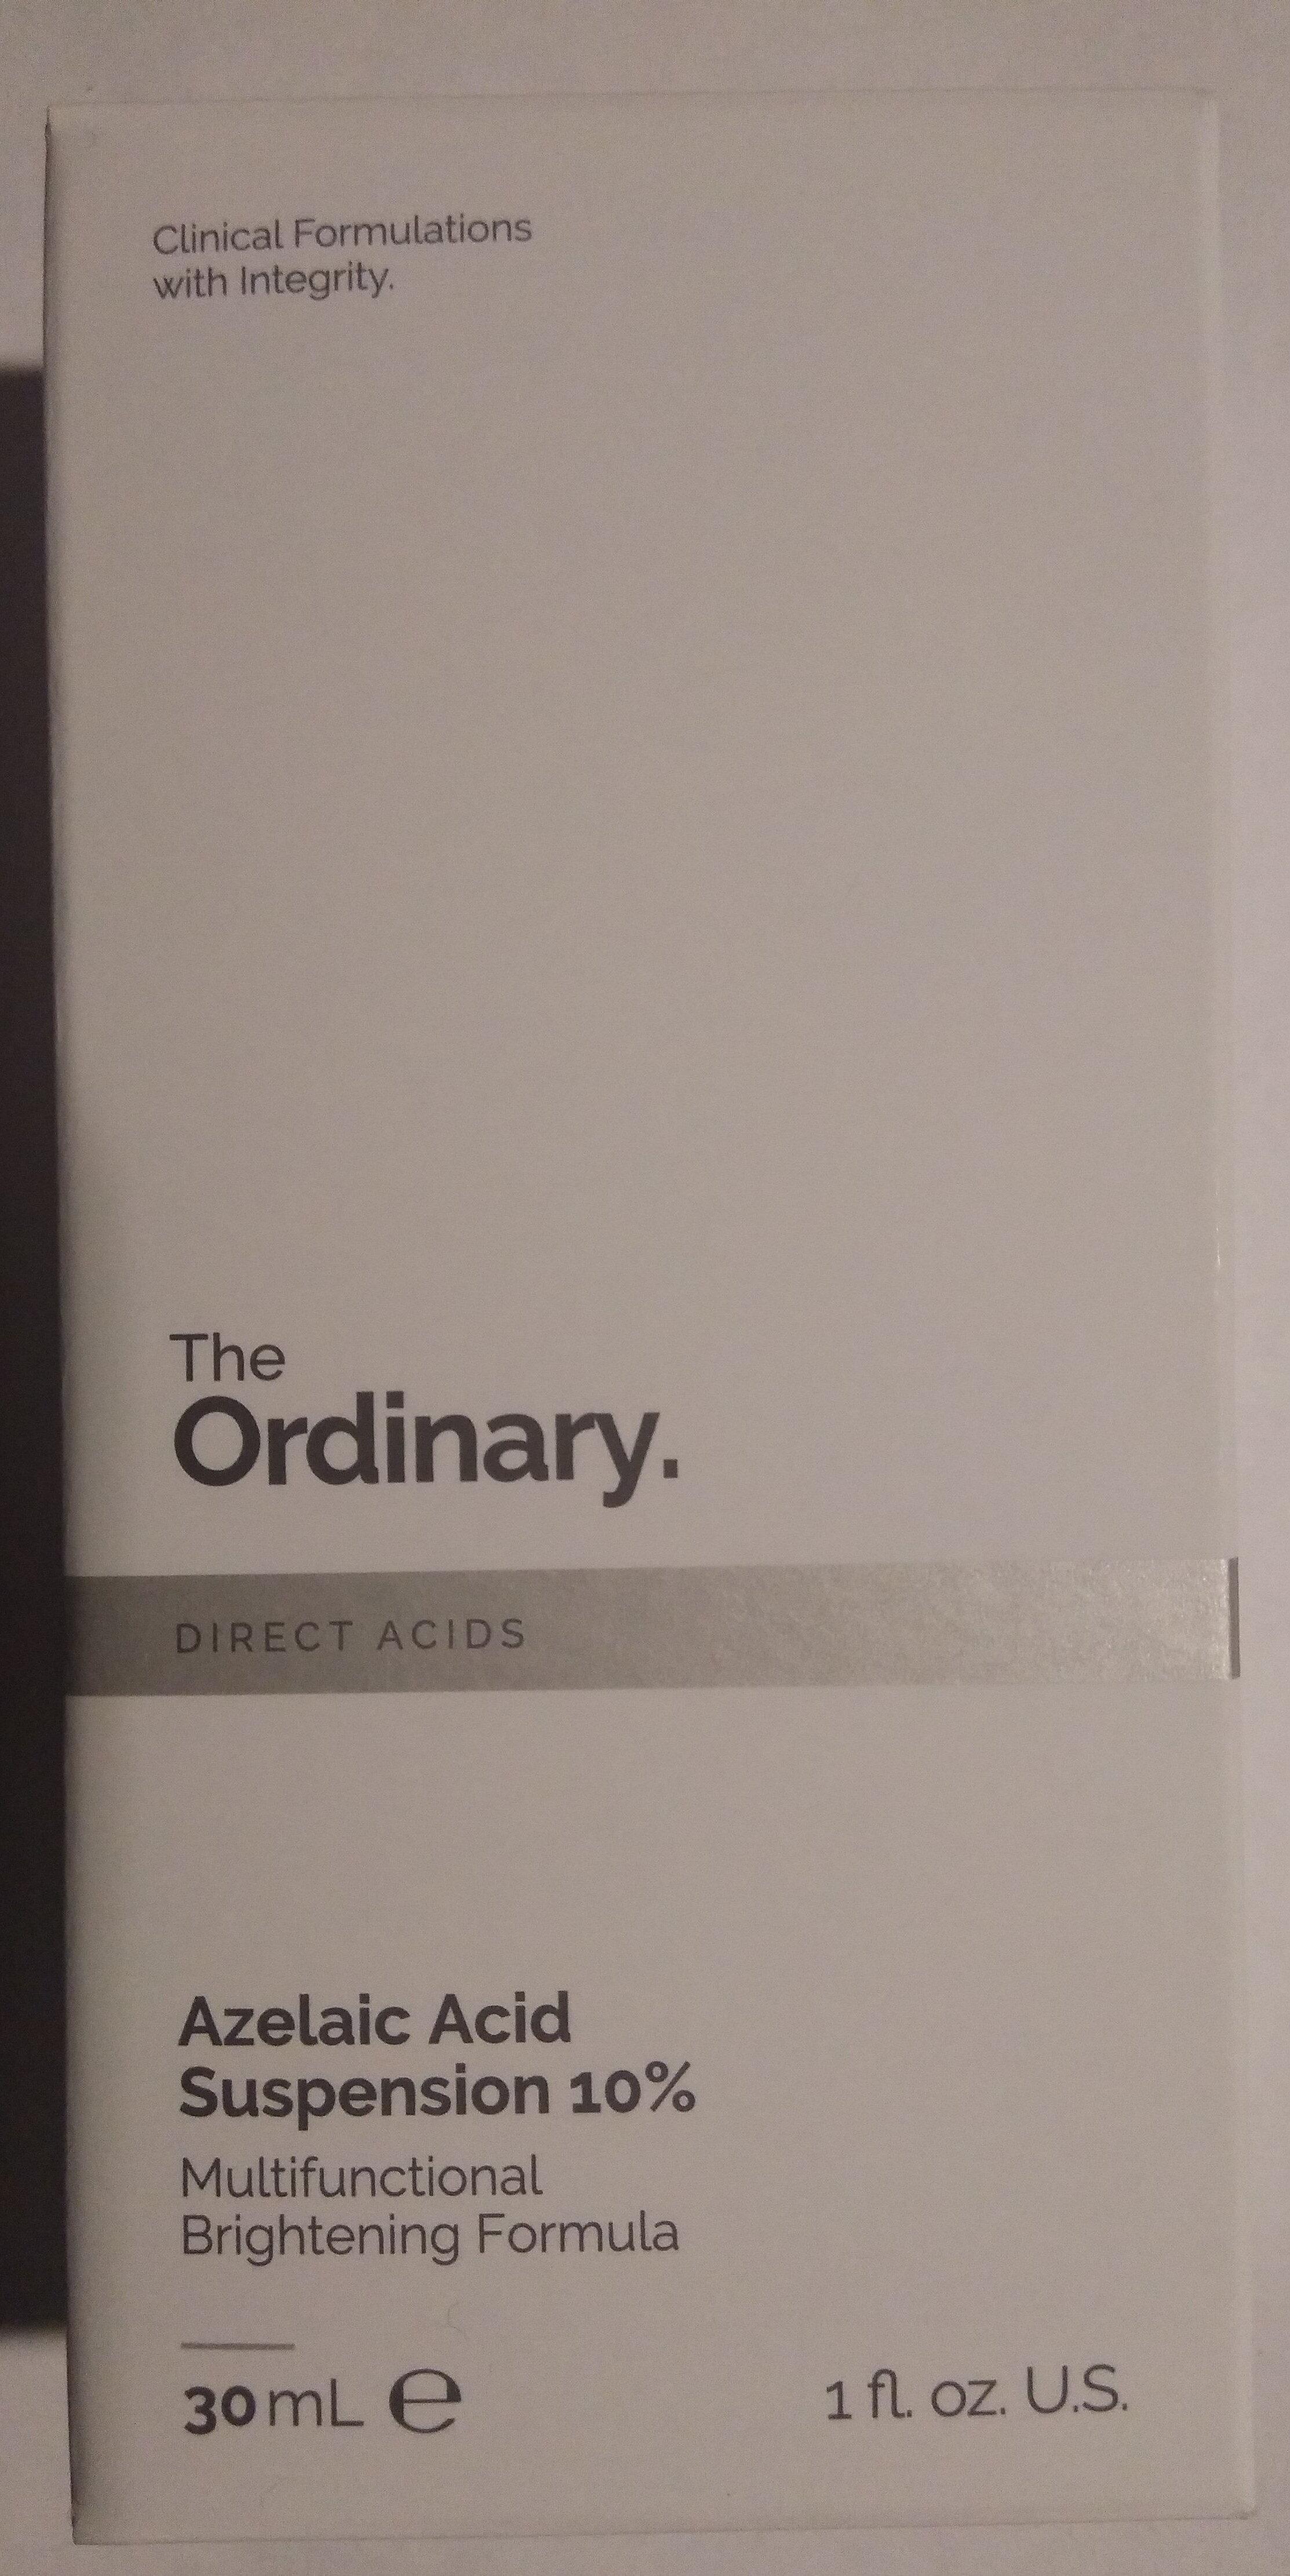 Azelaic Acid Suspension 10% - Product - en